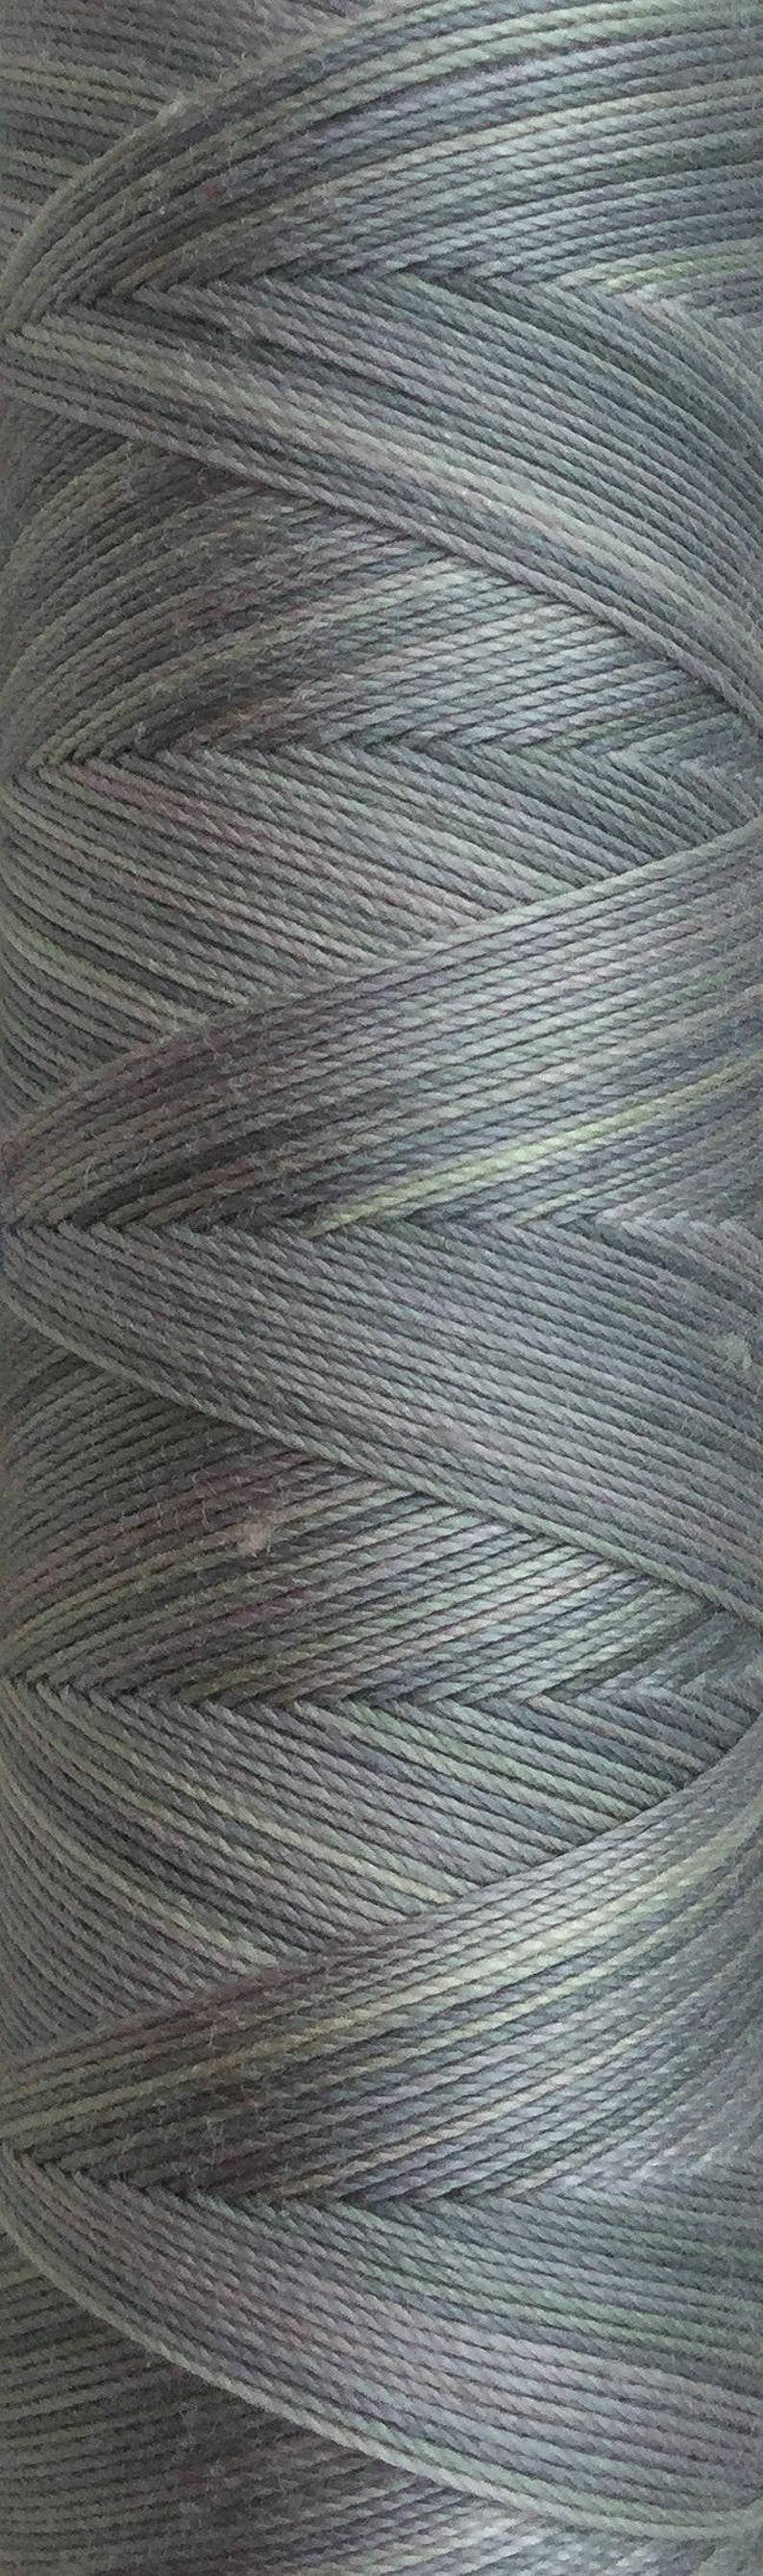 No.56 Pebble Hand Dyed Cotton Machine Thread Individual image 0